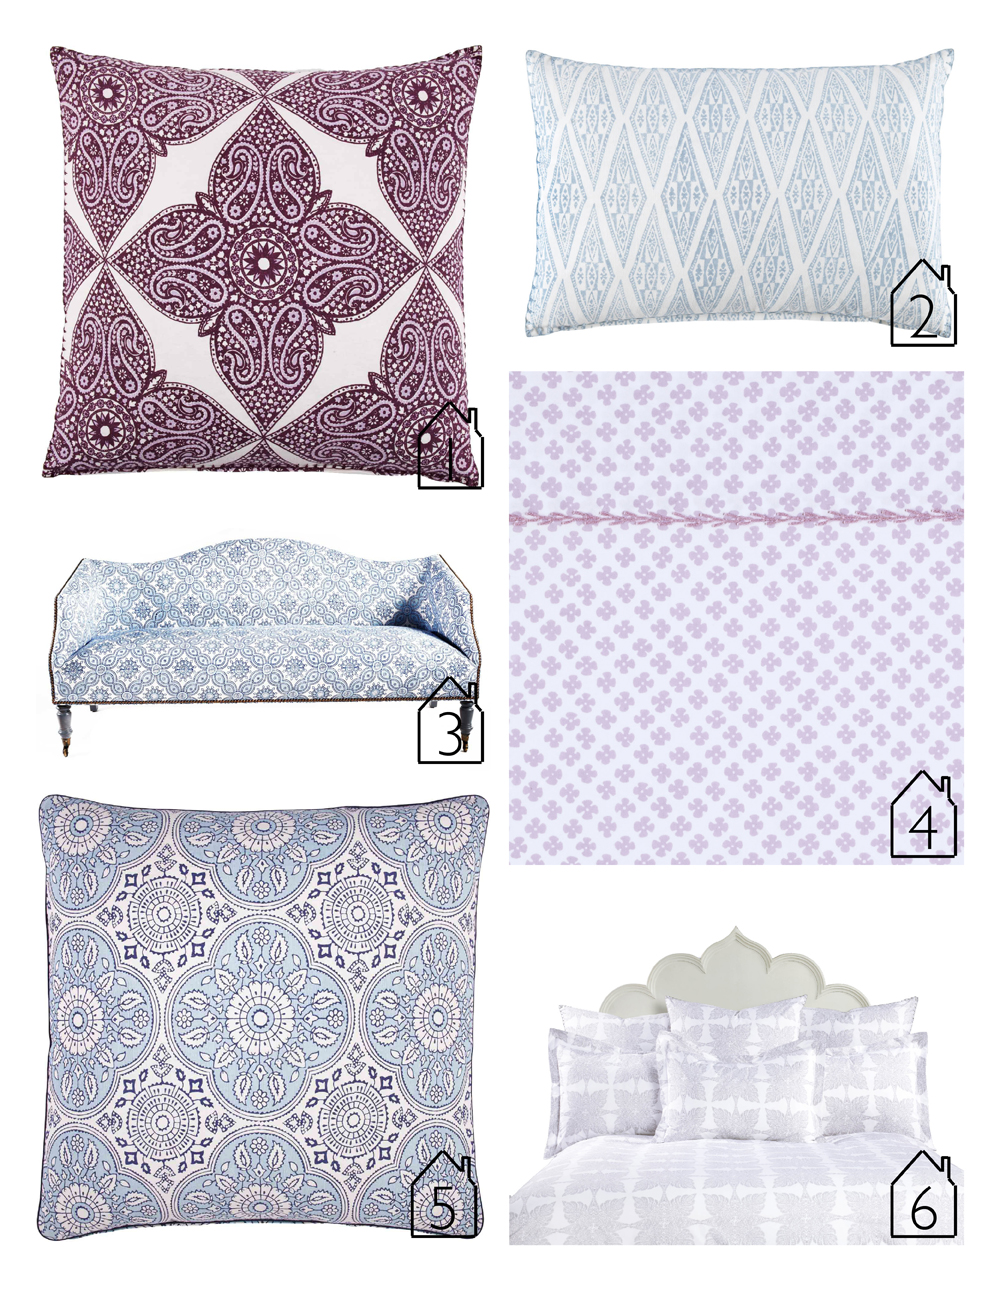 1.  Kumera Brinjal Euro  pillow 2.  North Sea Dec  pillow 3.  Luxor Settee  4.  Rabari Lavender  sheet 5.  Madura Lapis Euro  pillow 6.  Monsoon  bedding